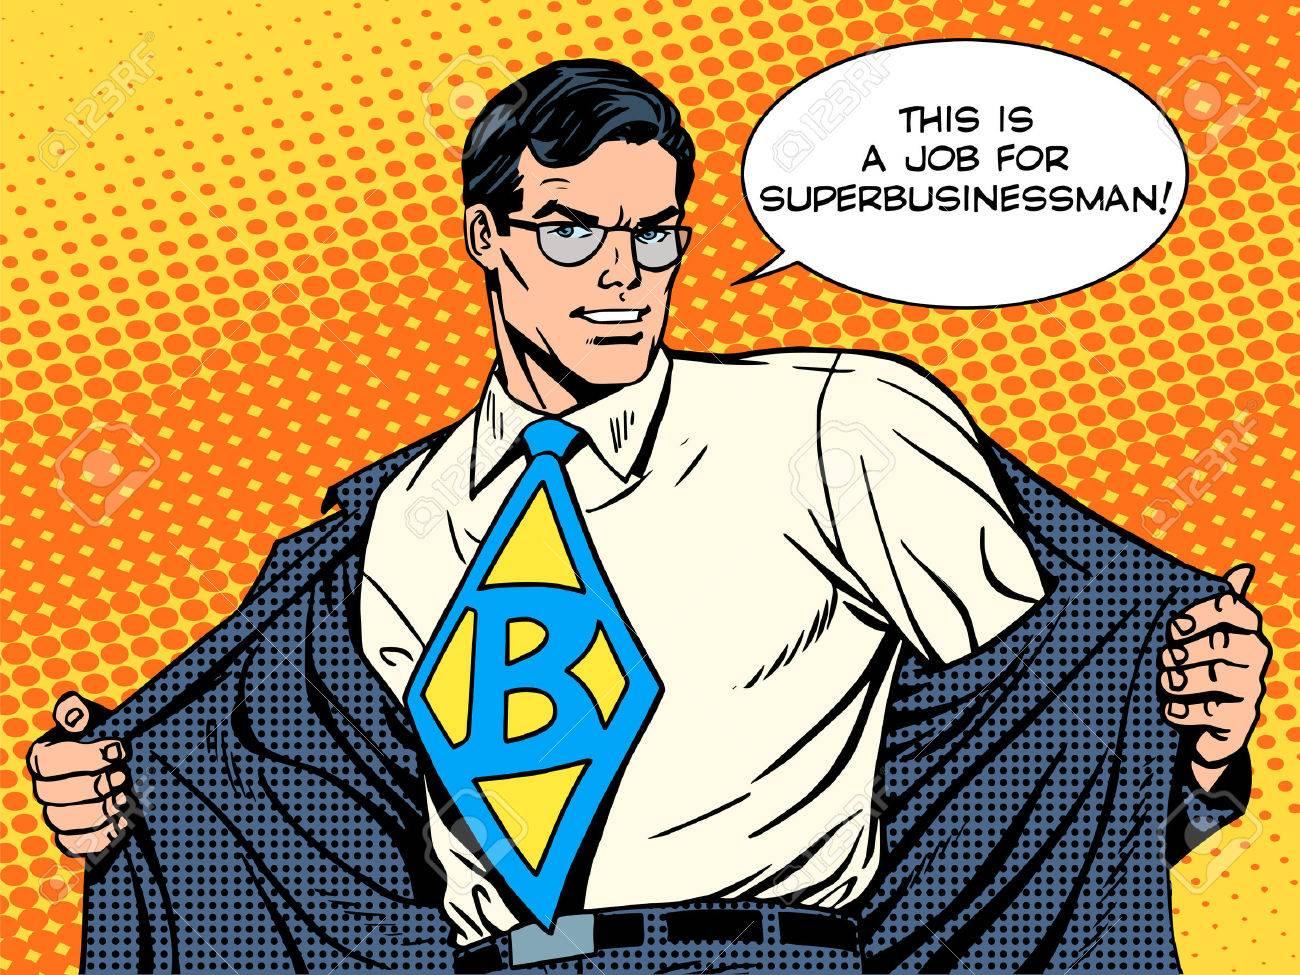 job super businessman hero retro pop art style - 45630588